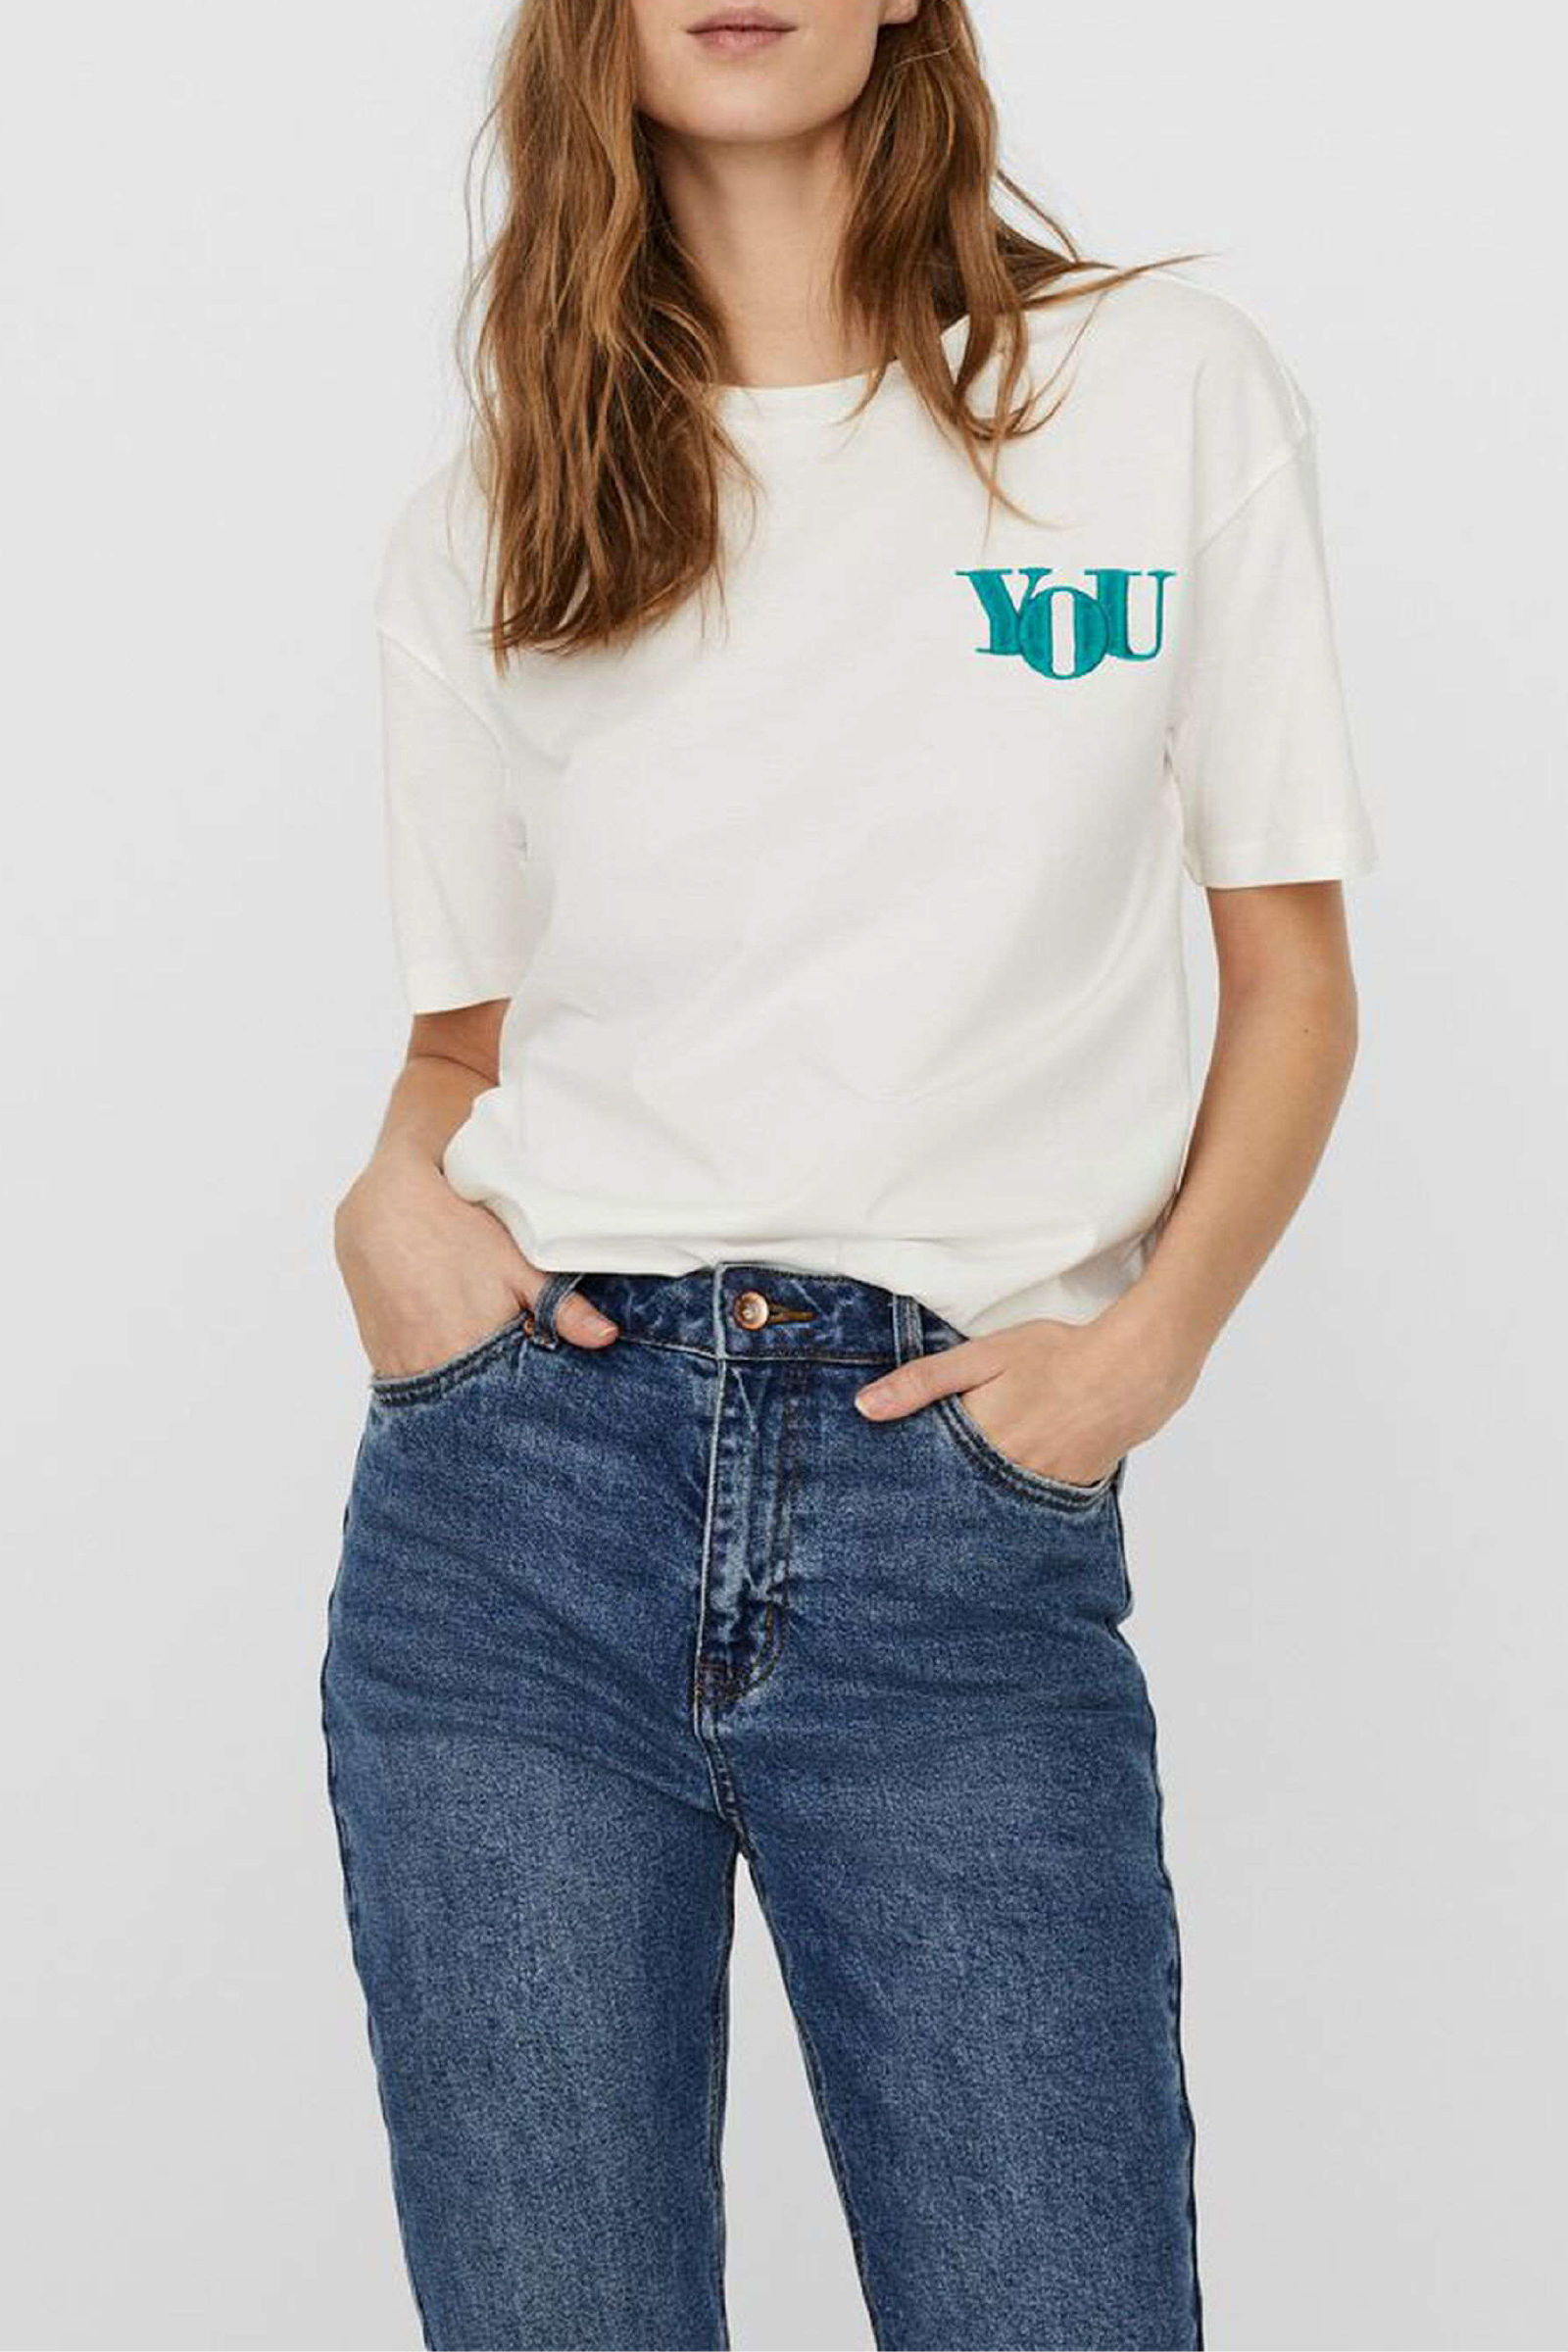 VERO MODA Women's T-Shirt VERO MODA | T-Shirt | 10241344Print-PARASAILING YOU